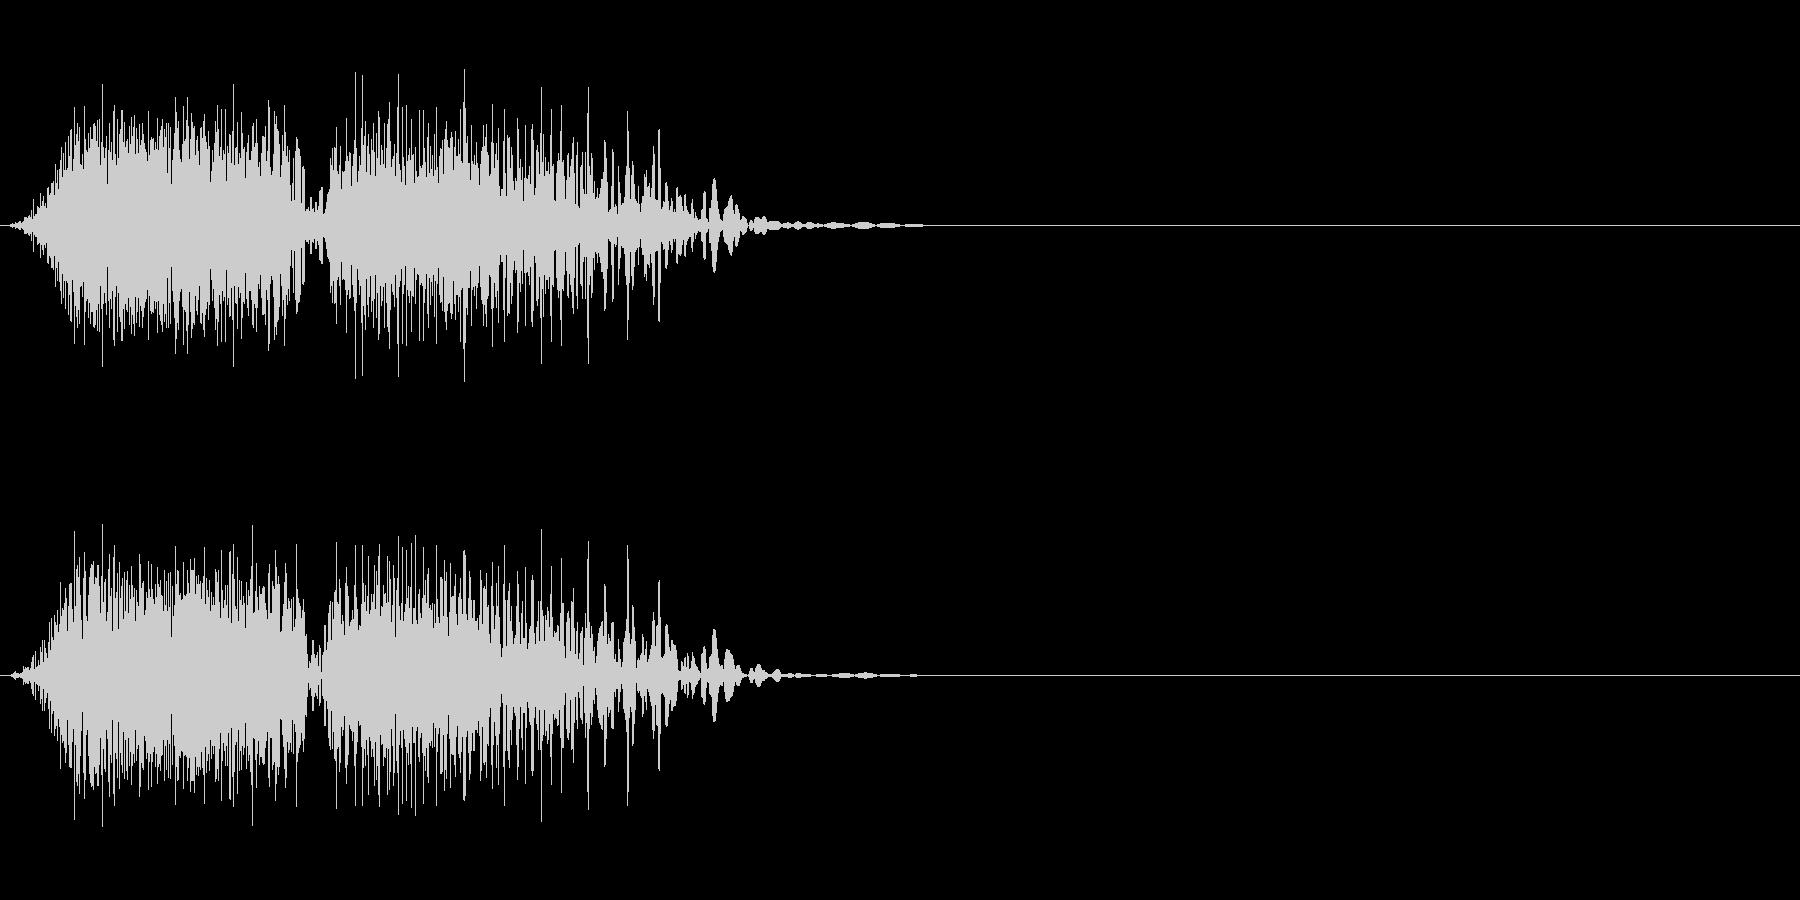 DJスクラッチ06_ワンショット01の未再生の波形